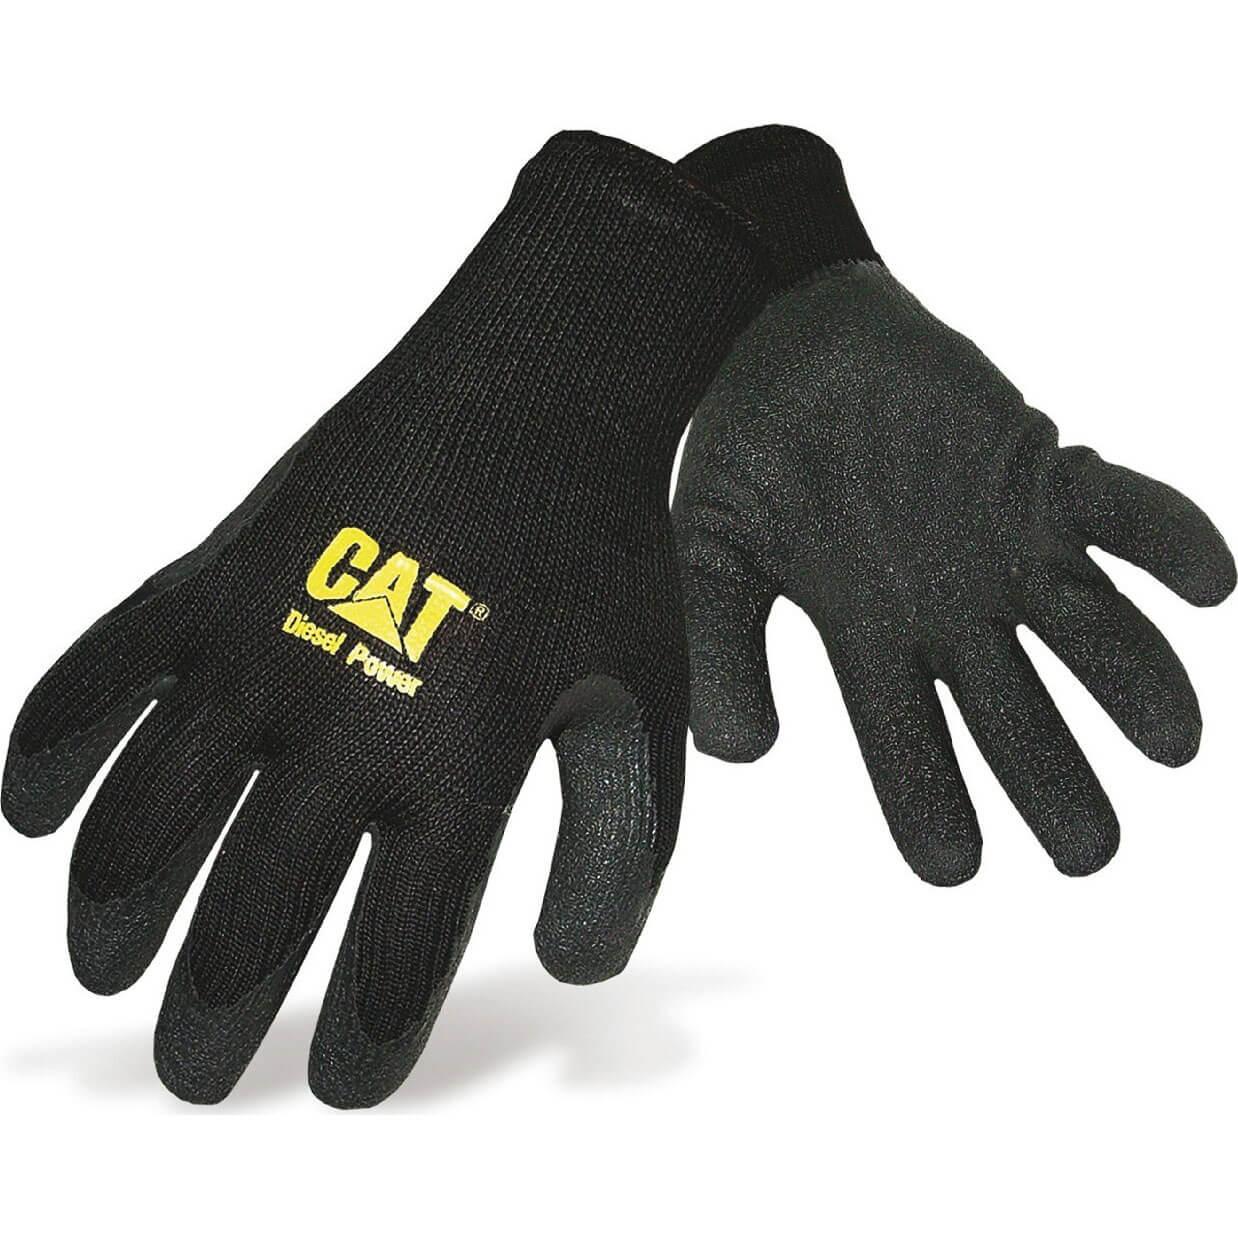 Caterpillar Thermal Gripster Glove XL